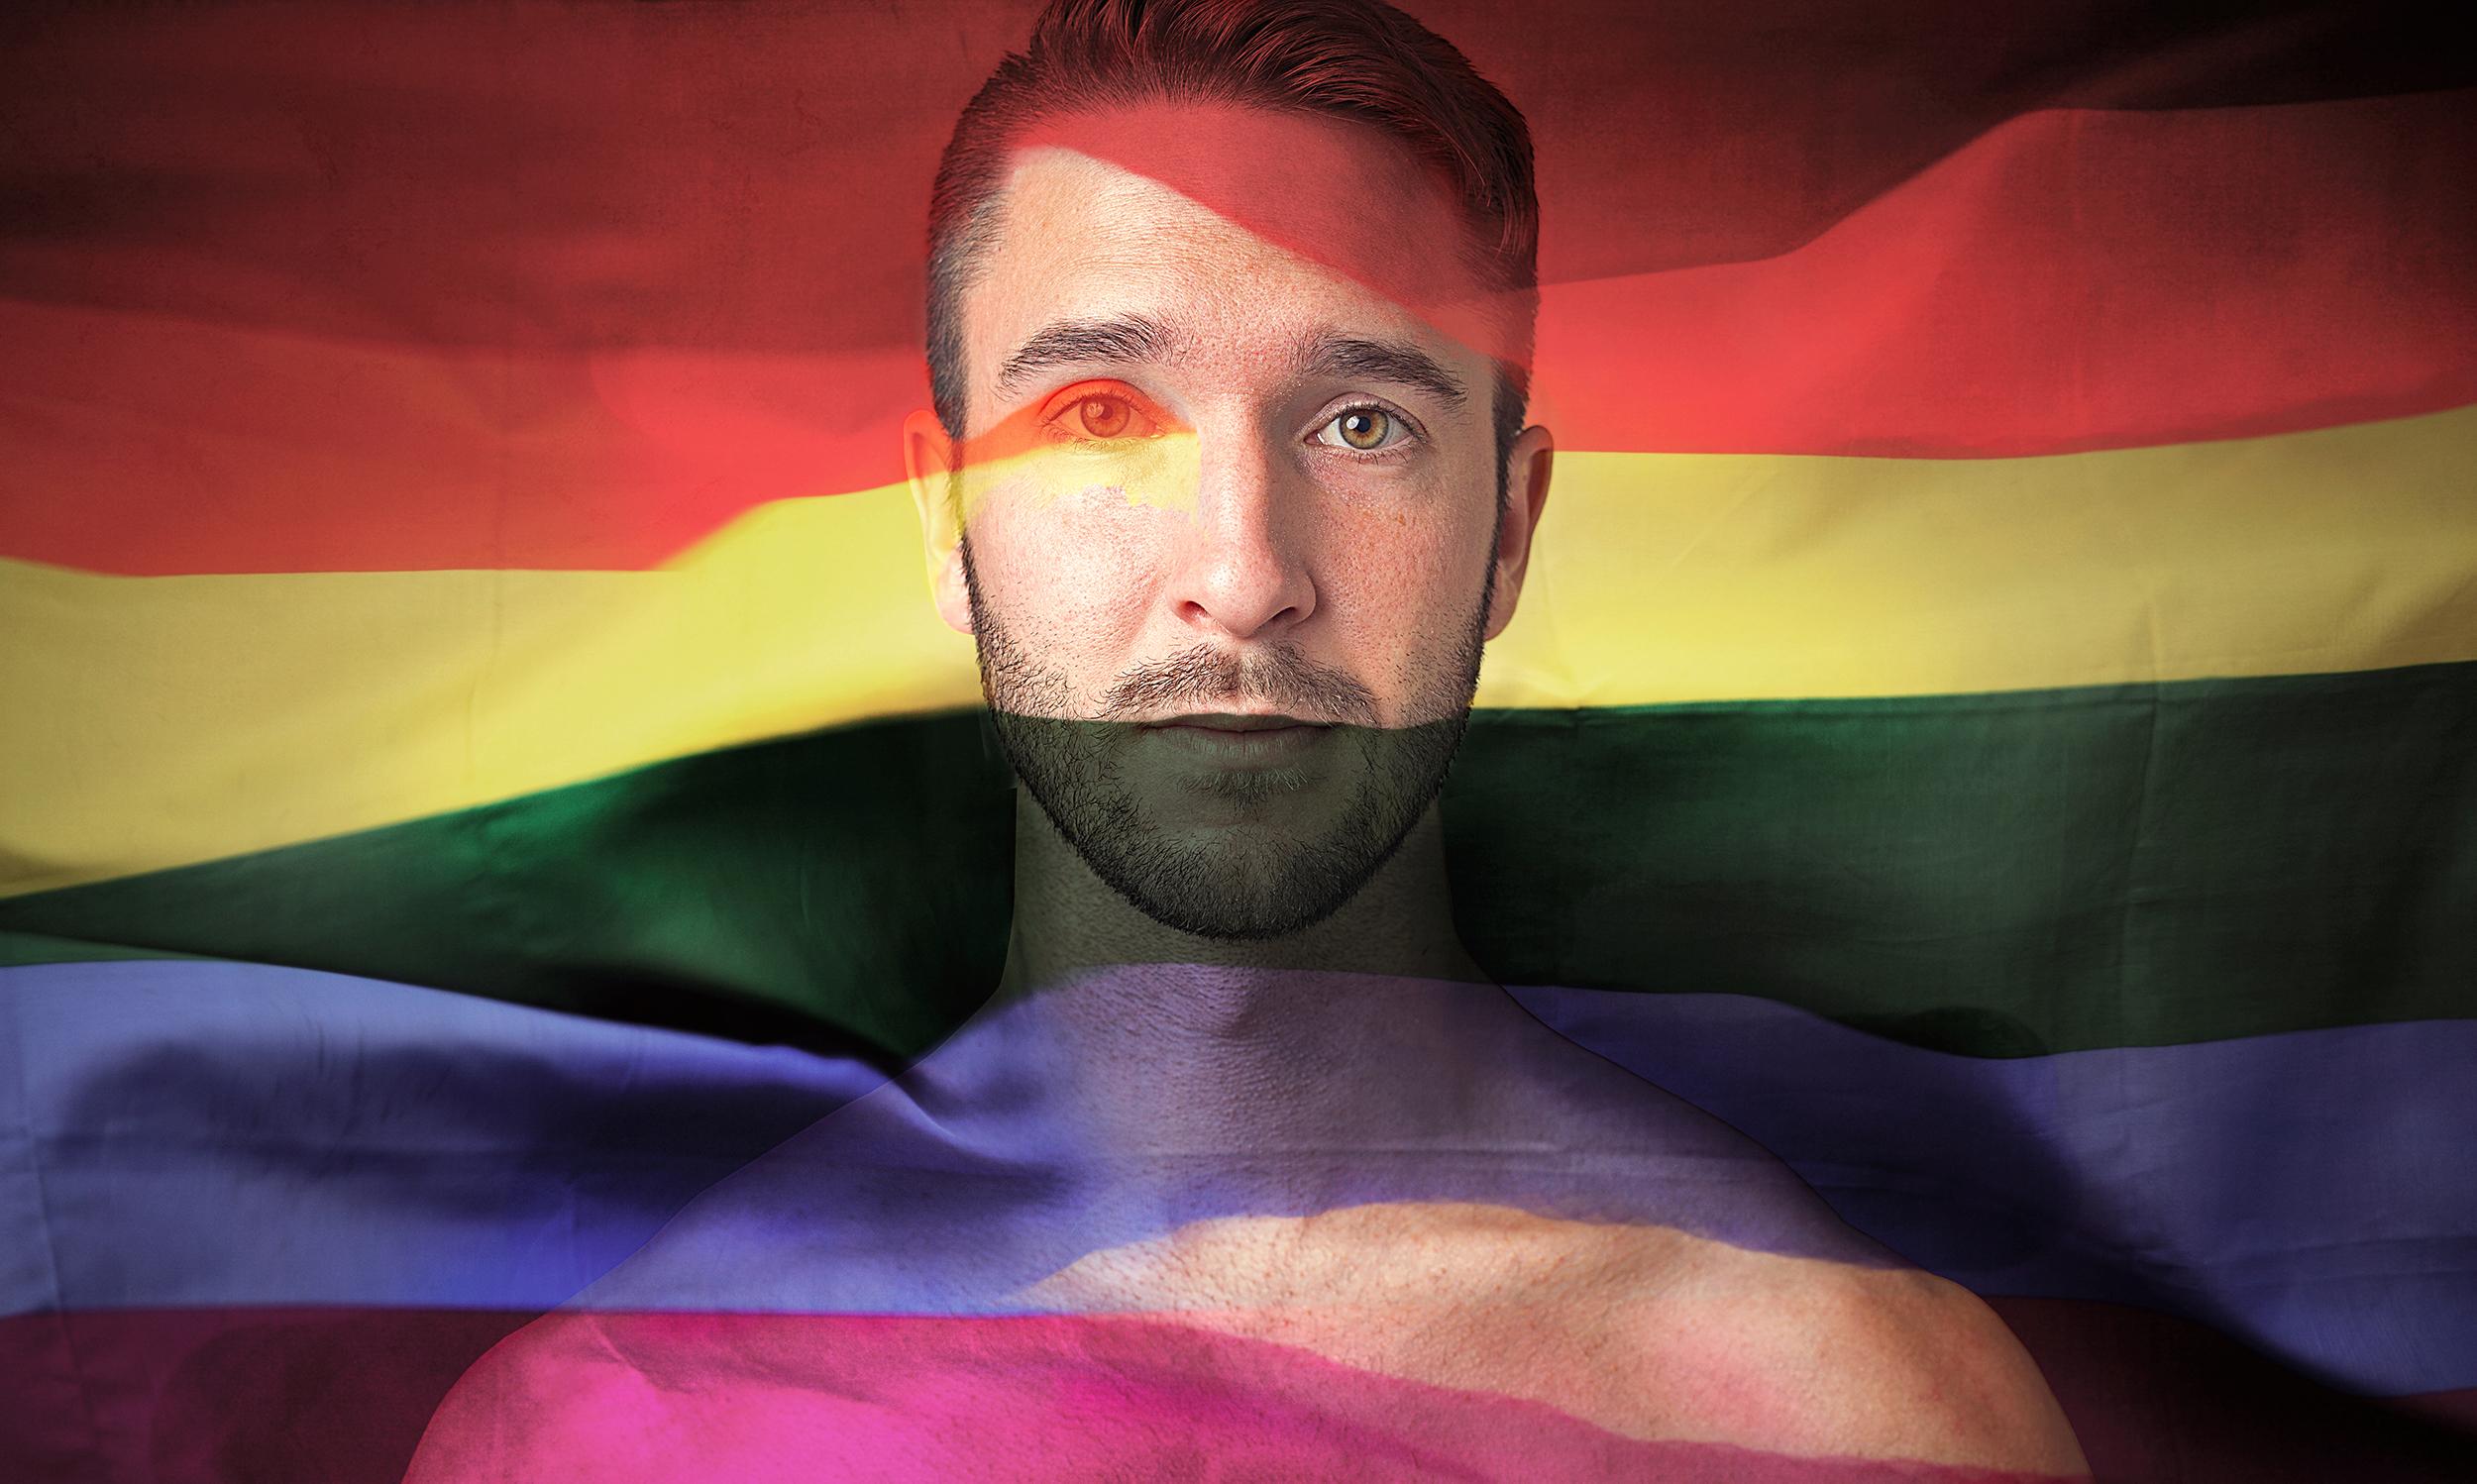 Gay Pride - LBGTQ+ Advocate